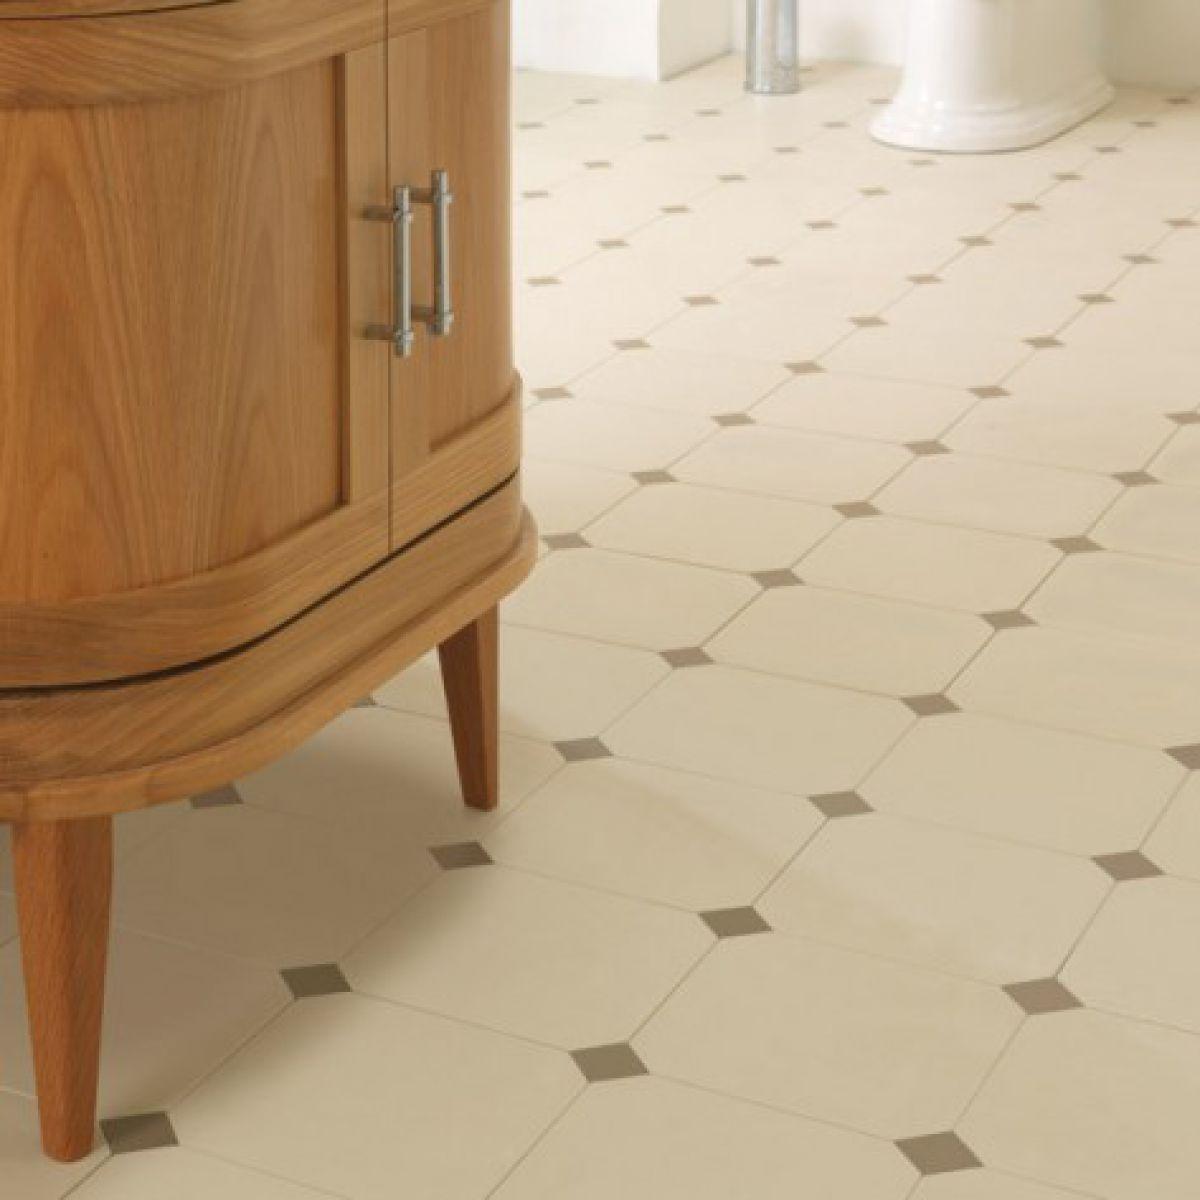 Elizabethan Octagonal Floor Tiles 20 X 20cm Home Tiles Ceramic Tiles